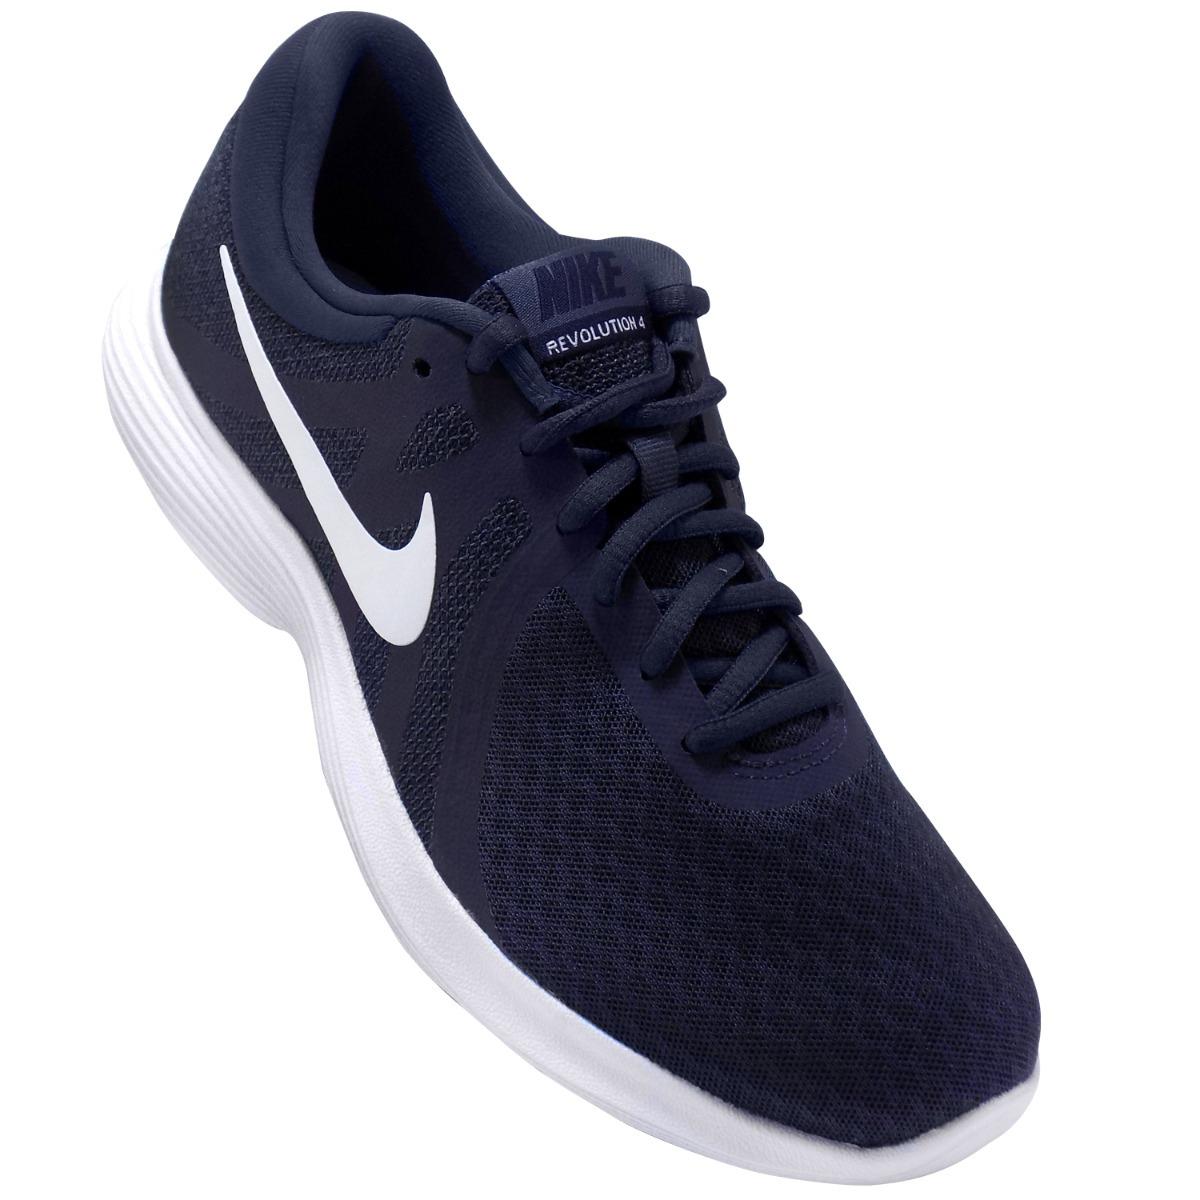 tenis nike revolution 4 running para hombre azul marino. Cargando zoom. 67a6487a379